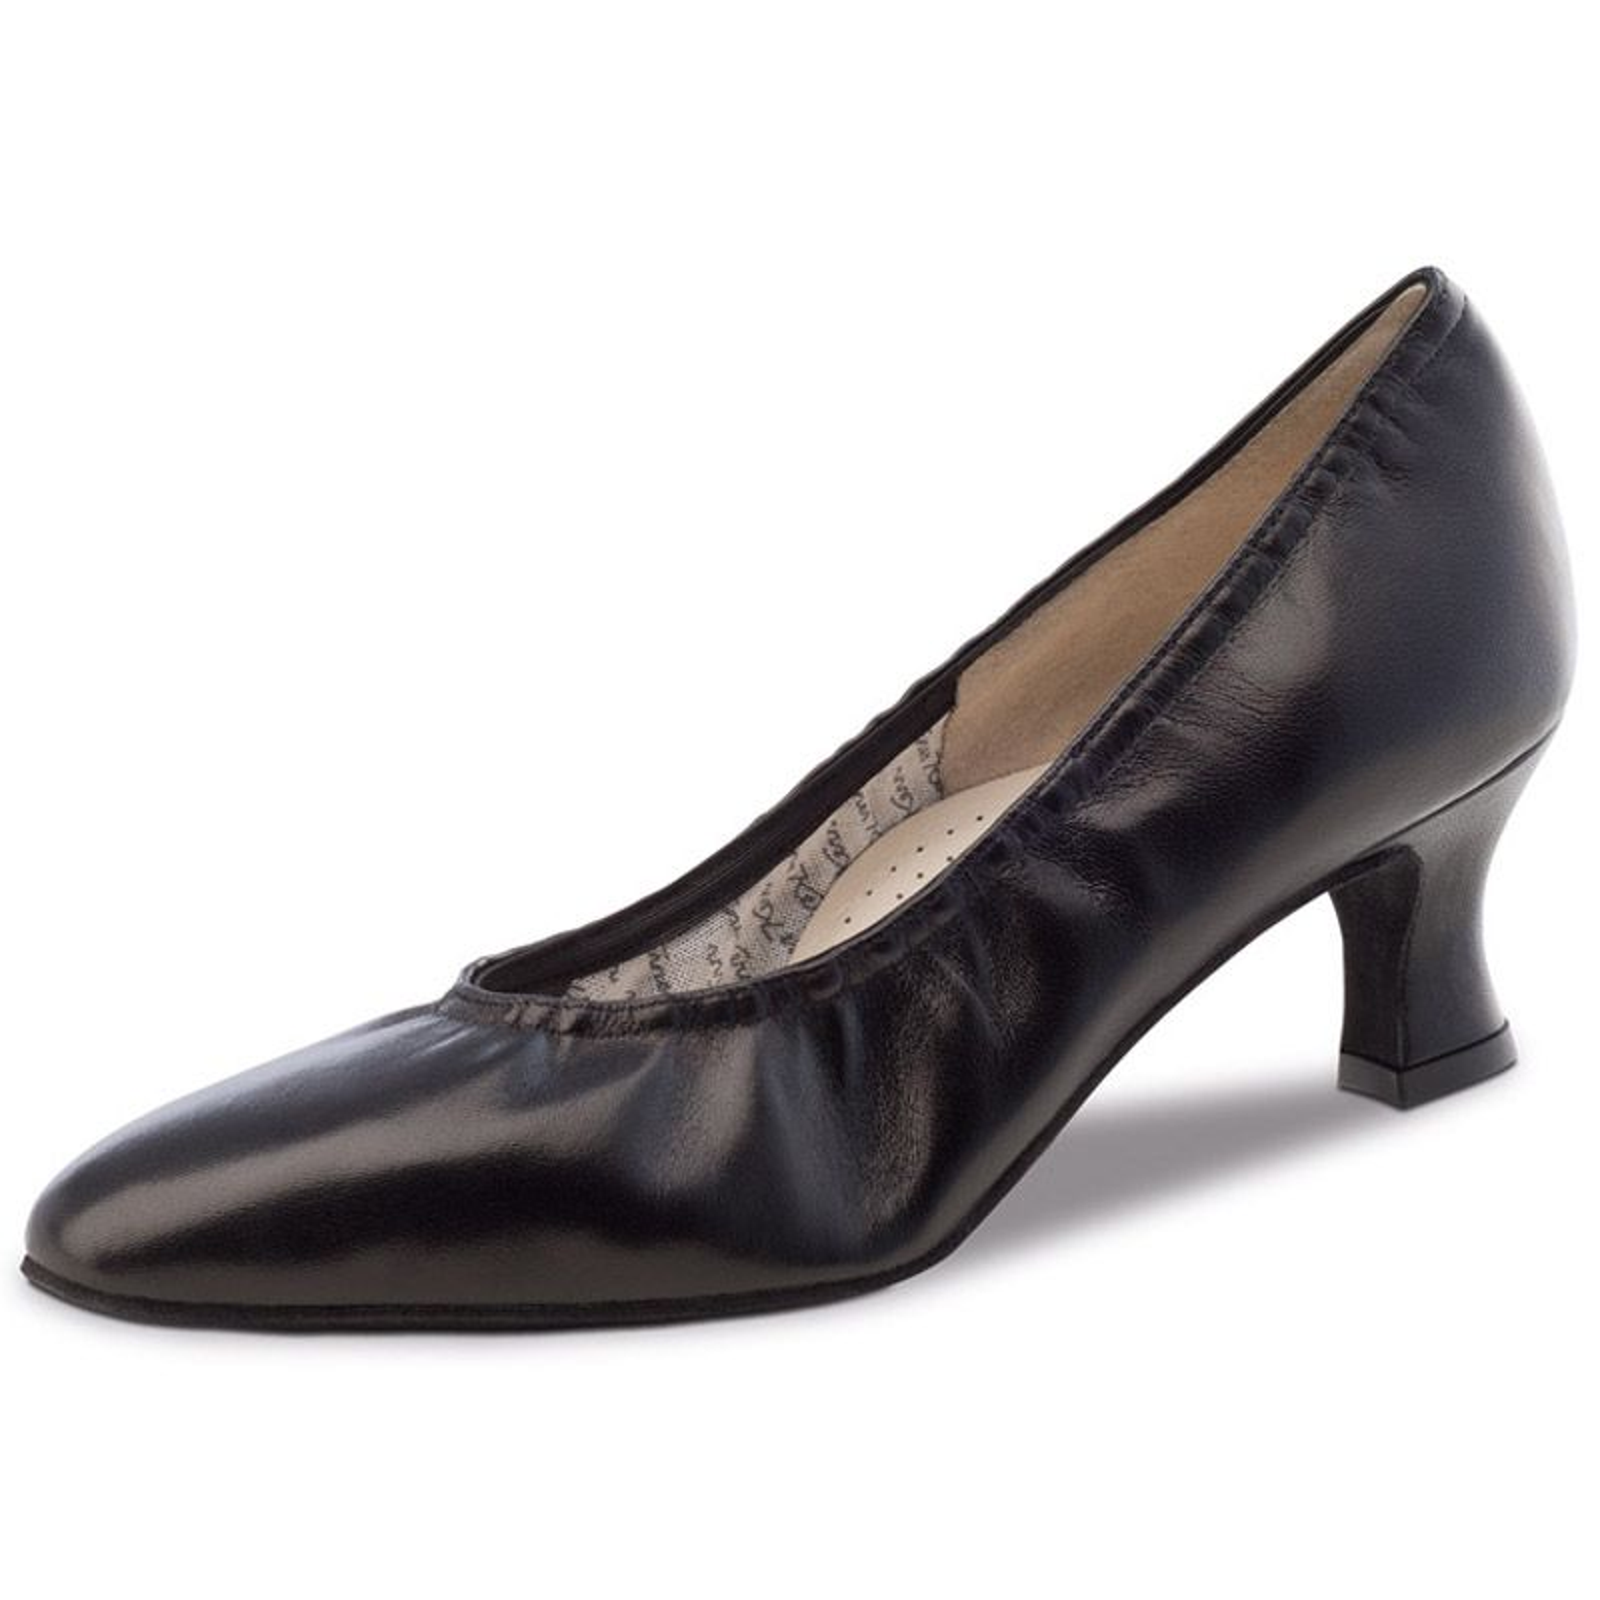 Kern De Danse Chaussures Werner Gilian OPuXikZTw